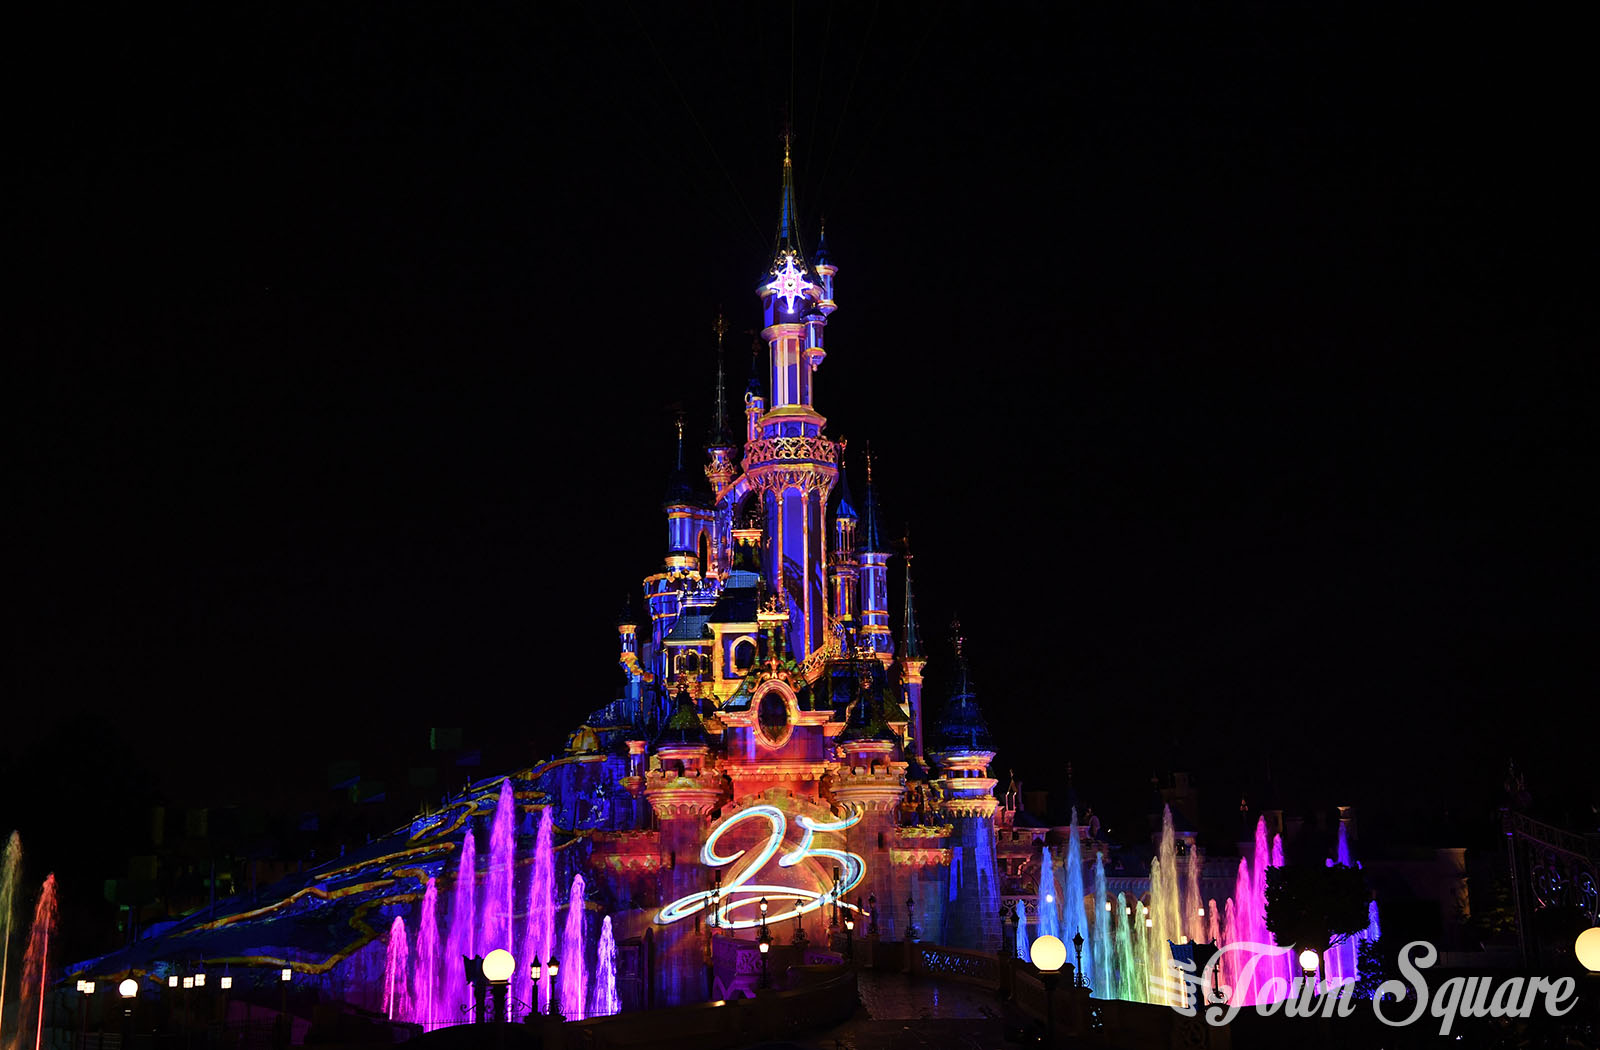 Disneyland Paris 25th anniversary castle